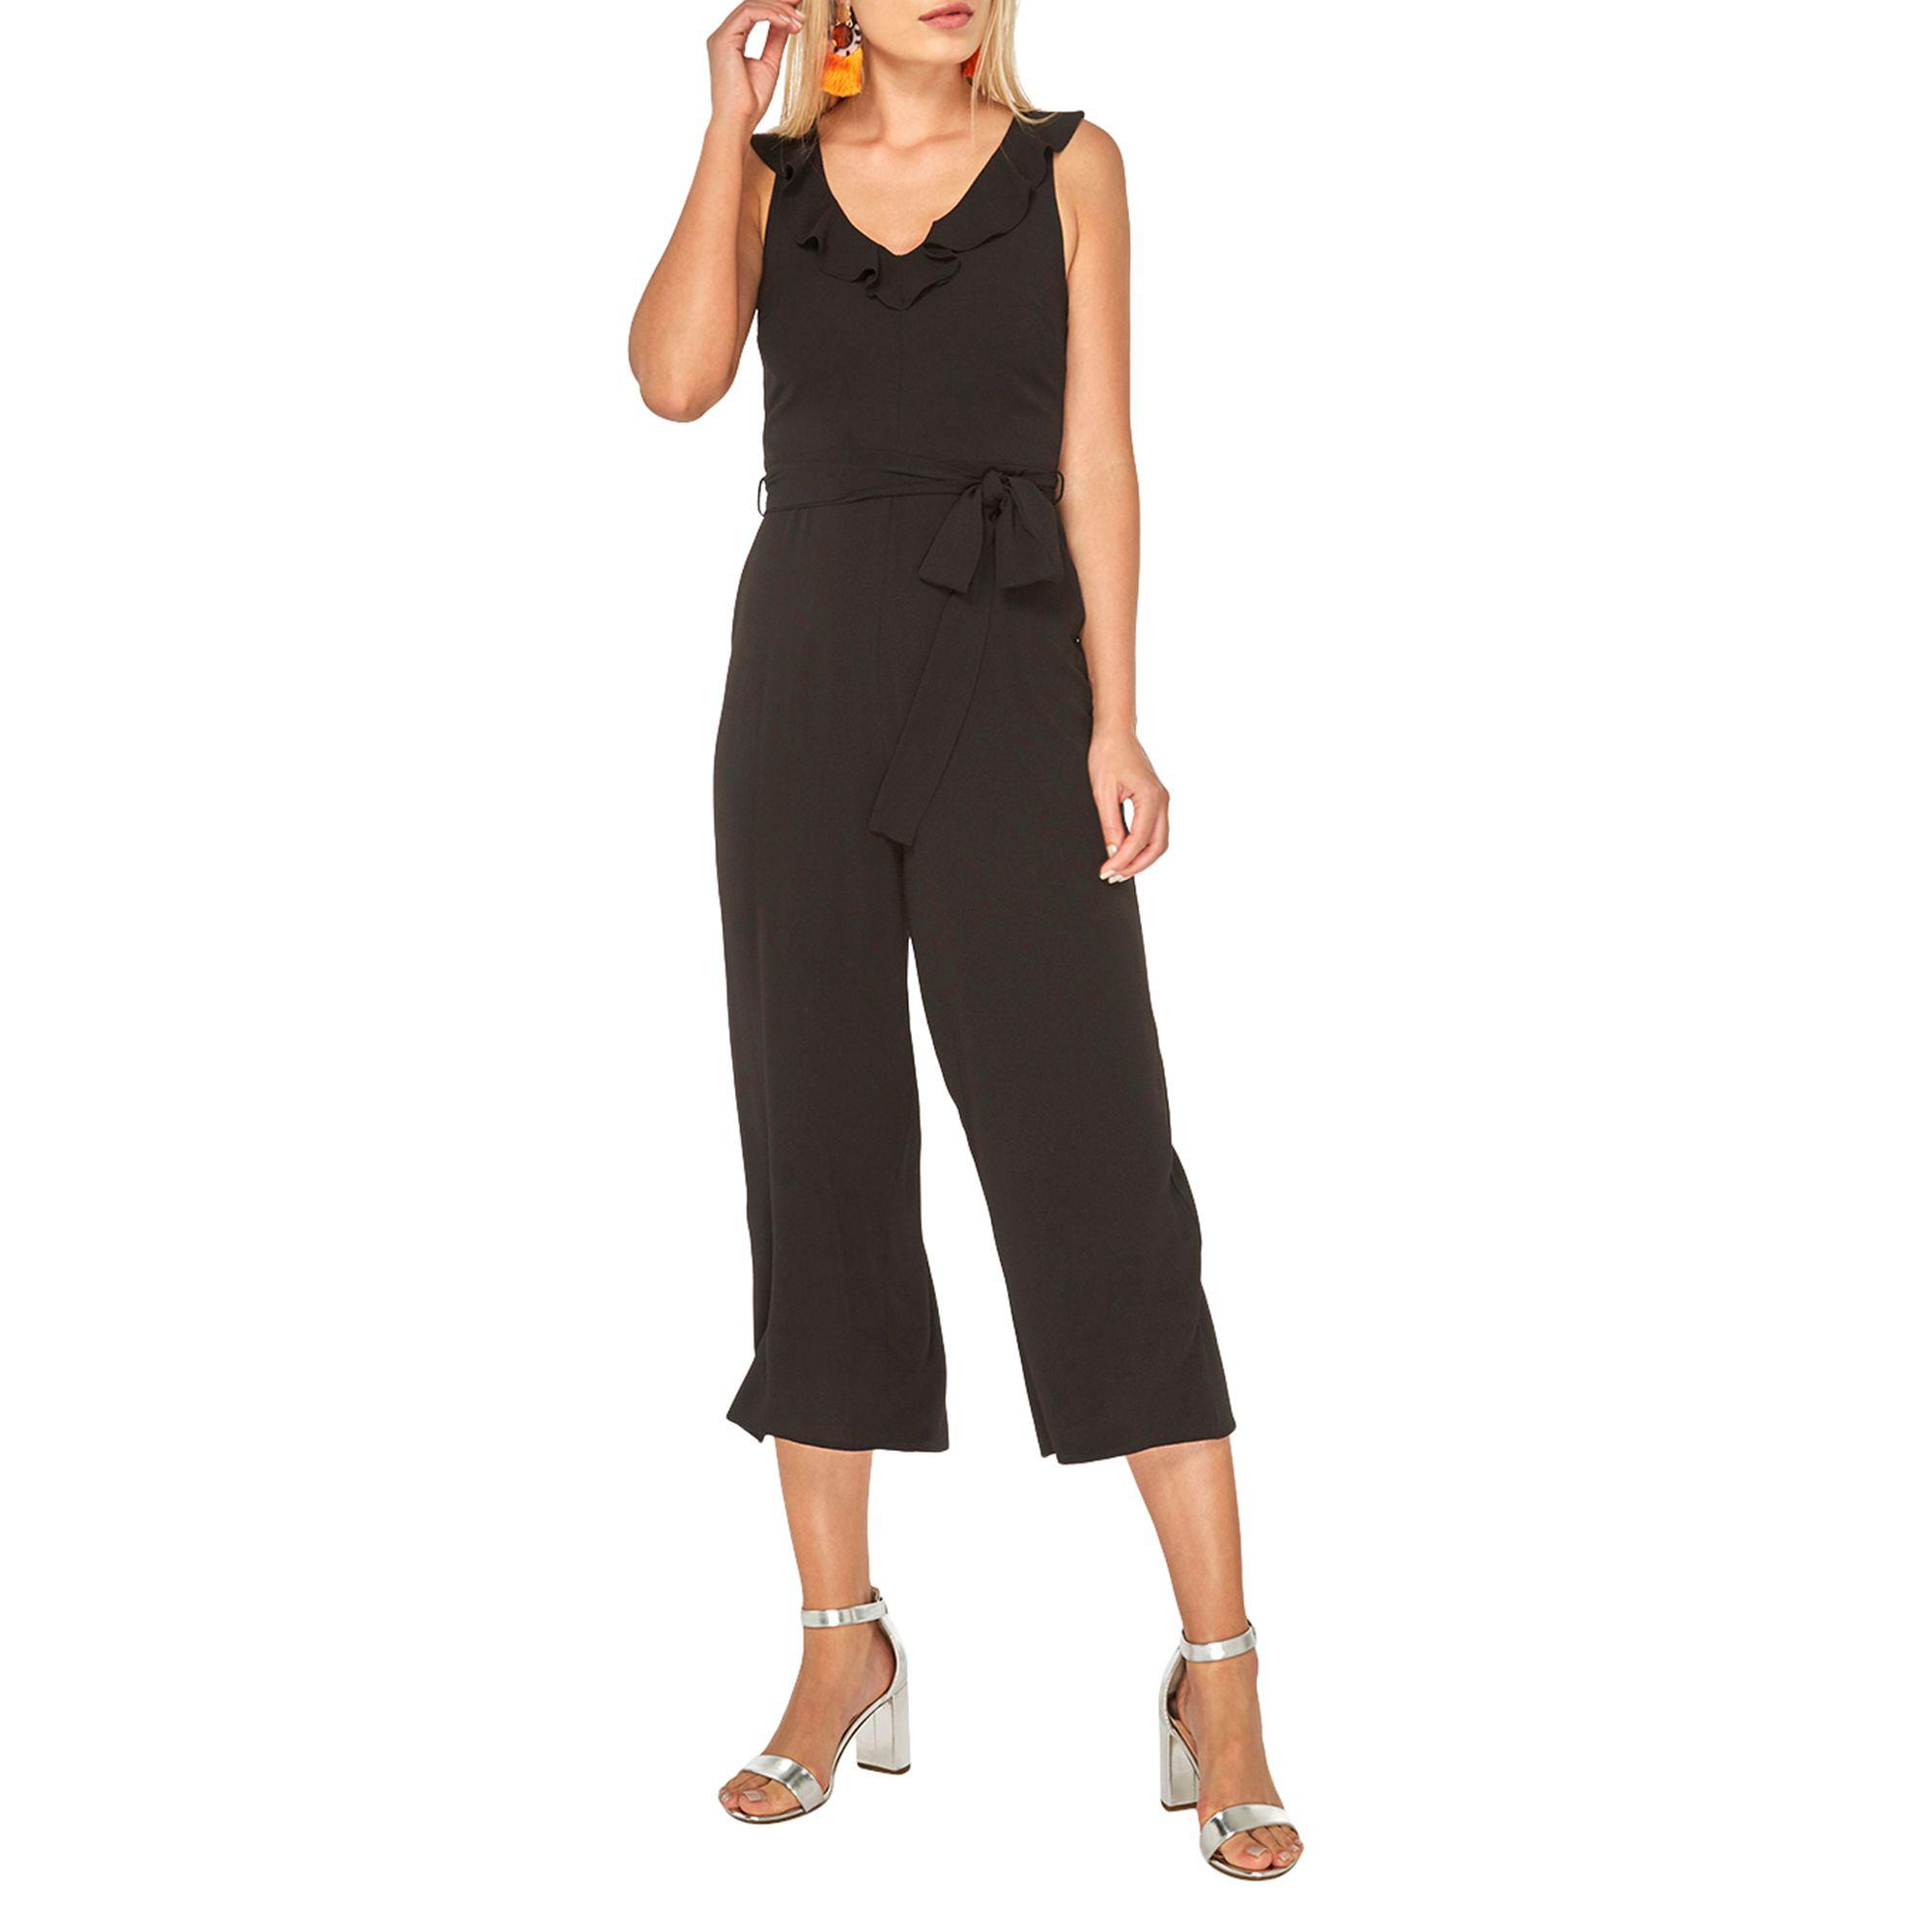 1d63e4f860 Dorothy Perkins Black Ruffle Strap Culottes Jumpsuit in Black - Lyst